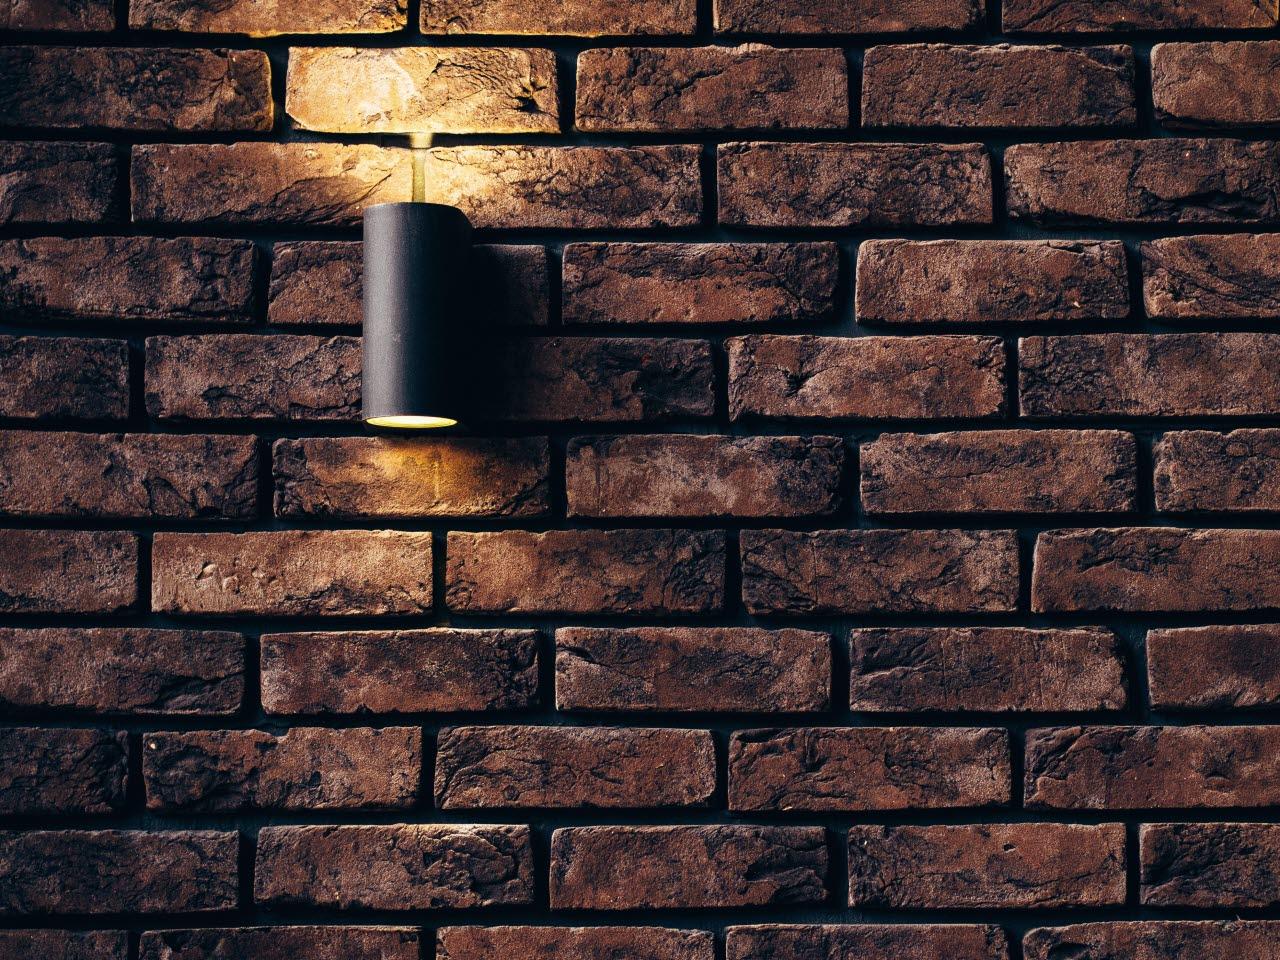 brick-brickwall-light-pexels